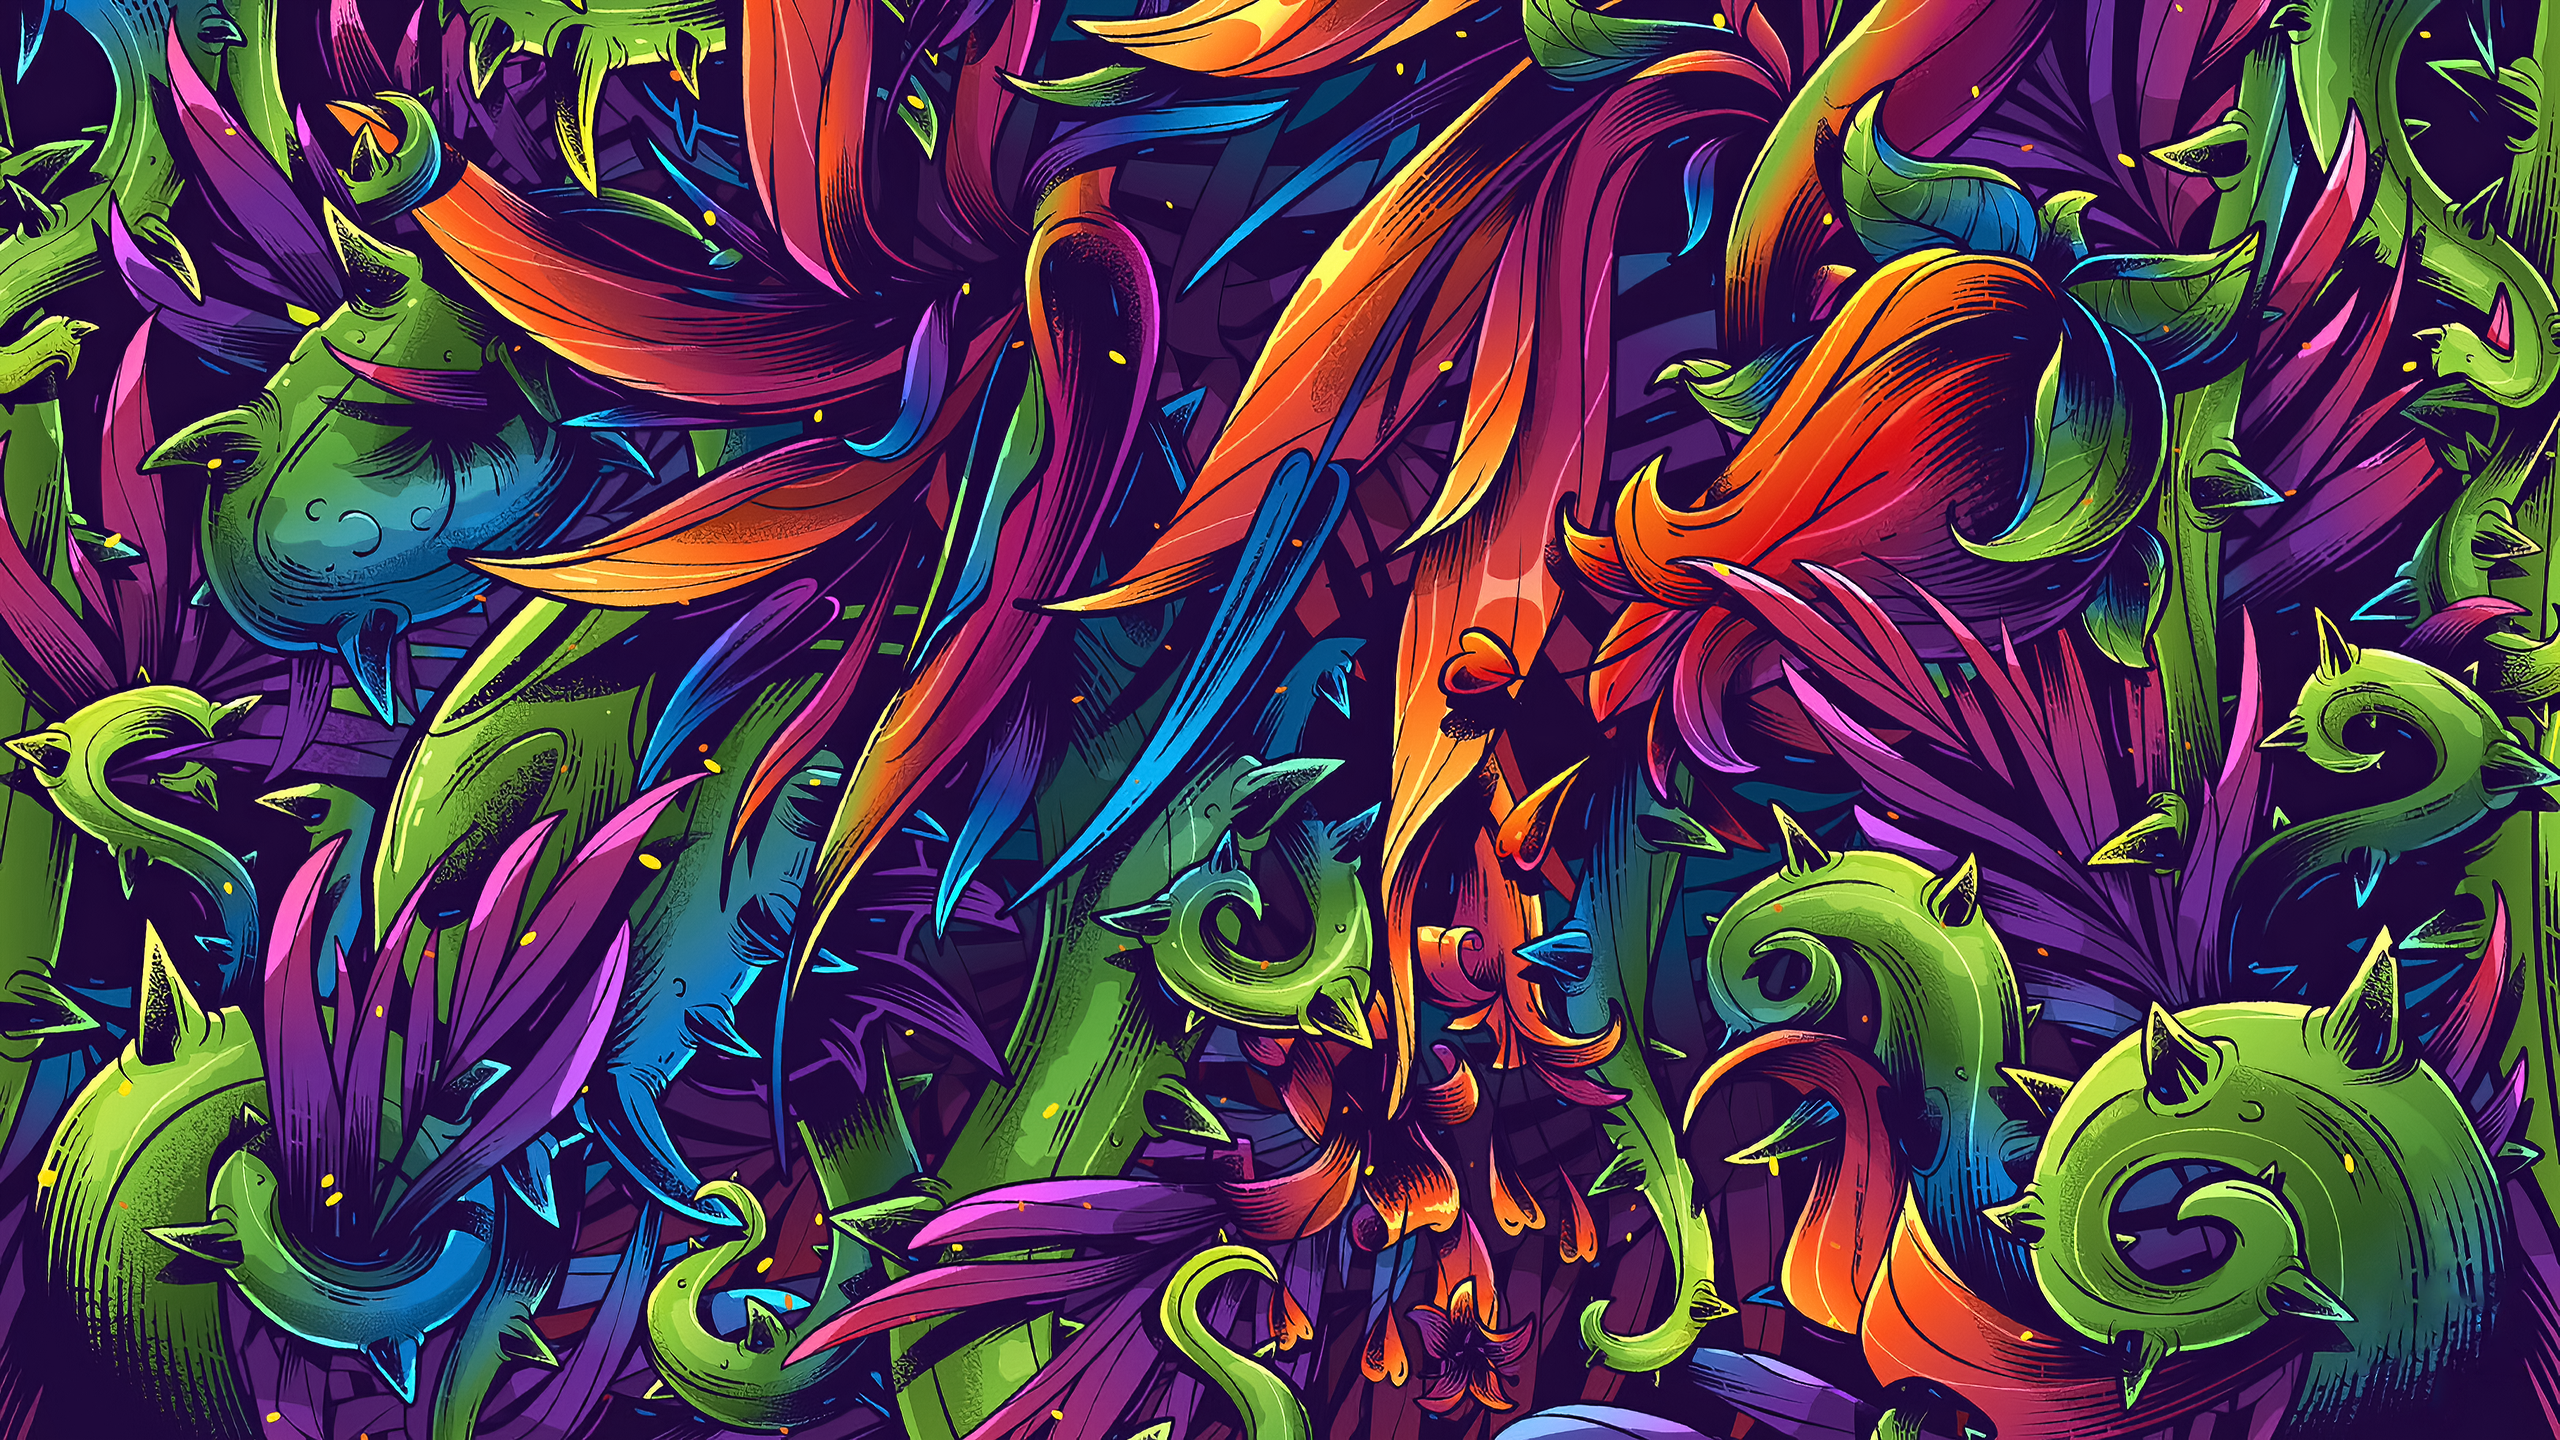 General 2560x1440 artwork colorful digital art abstract leaves plants Yaroslav Slavinskiy thorns